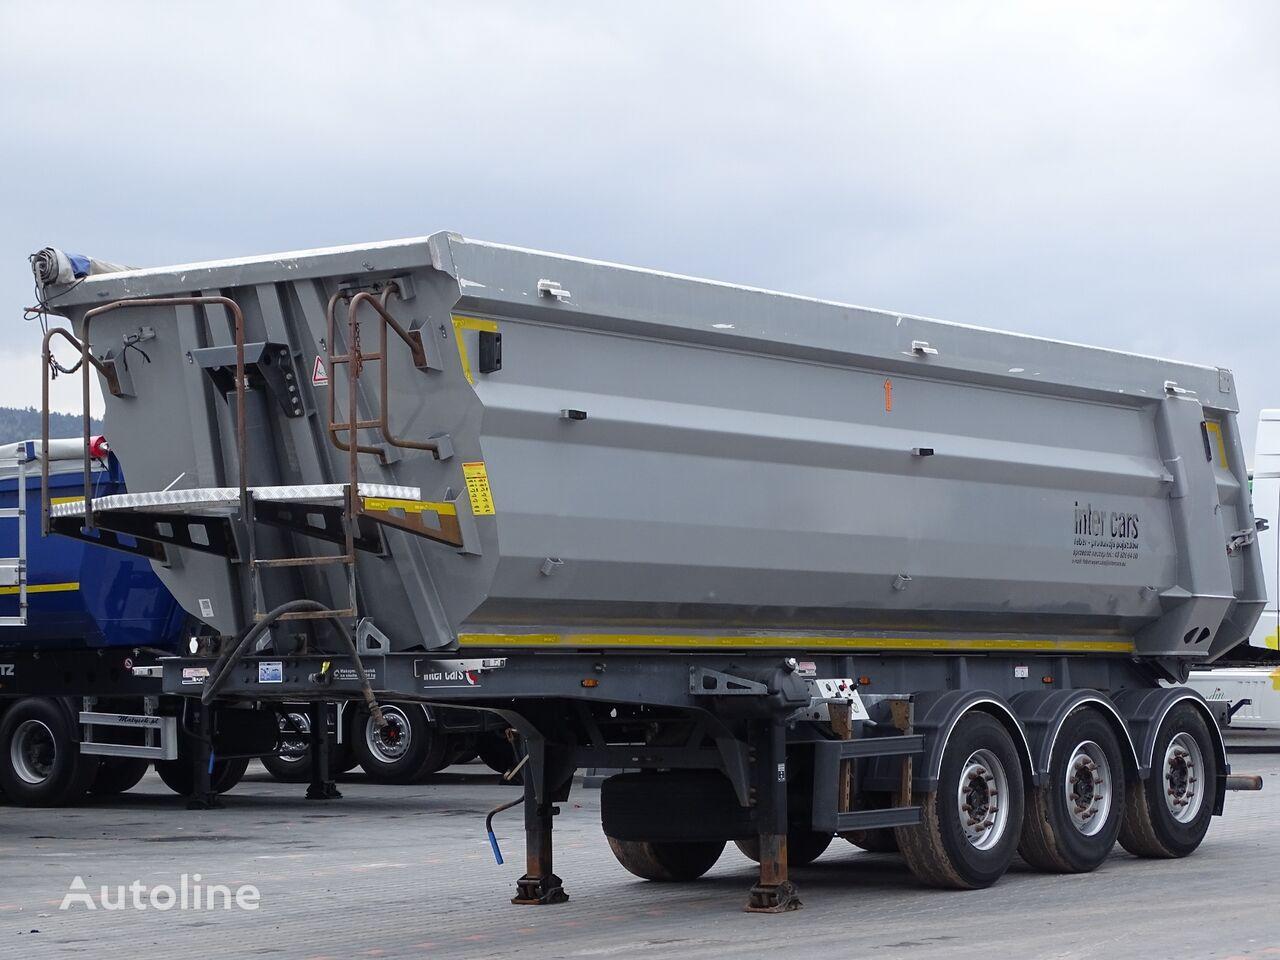 Inter Cars TIPPER 38 M3 / ALUMINIUM MULD / WEIGHT: 5 400 KG / LIFTED AXLE / tipper semi-trailer